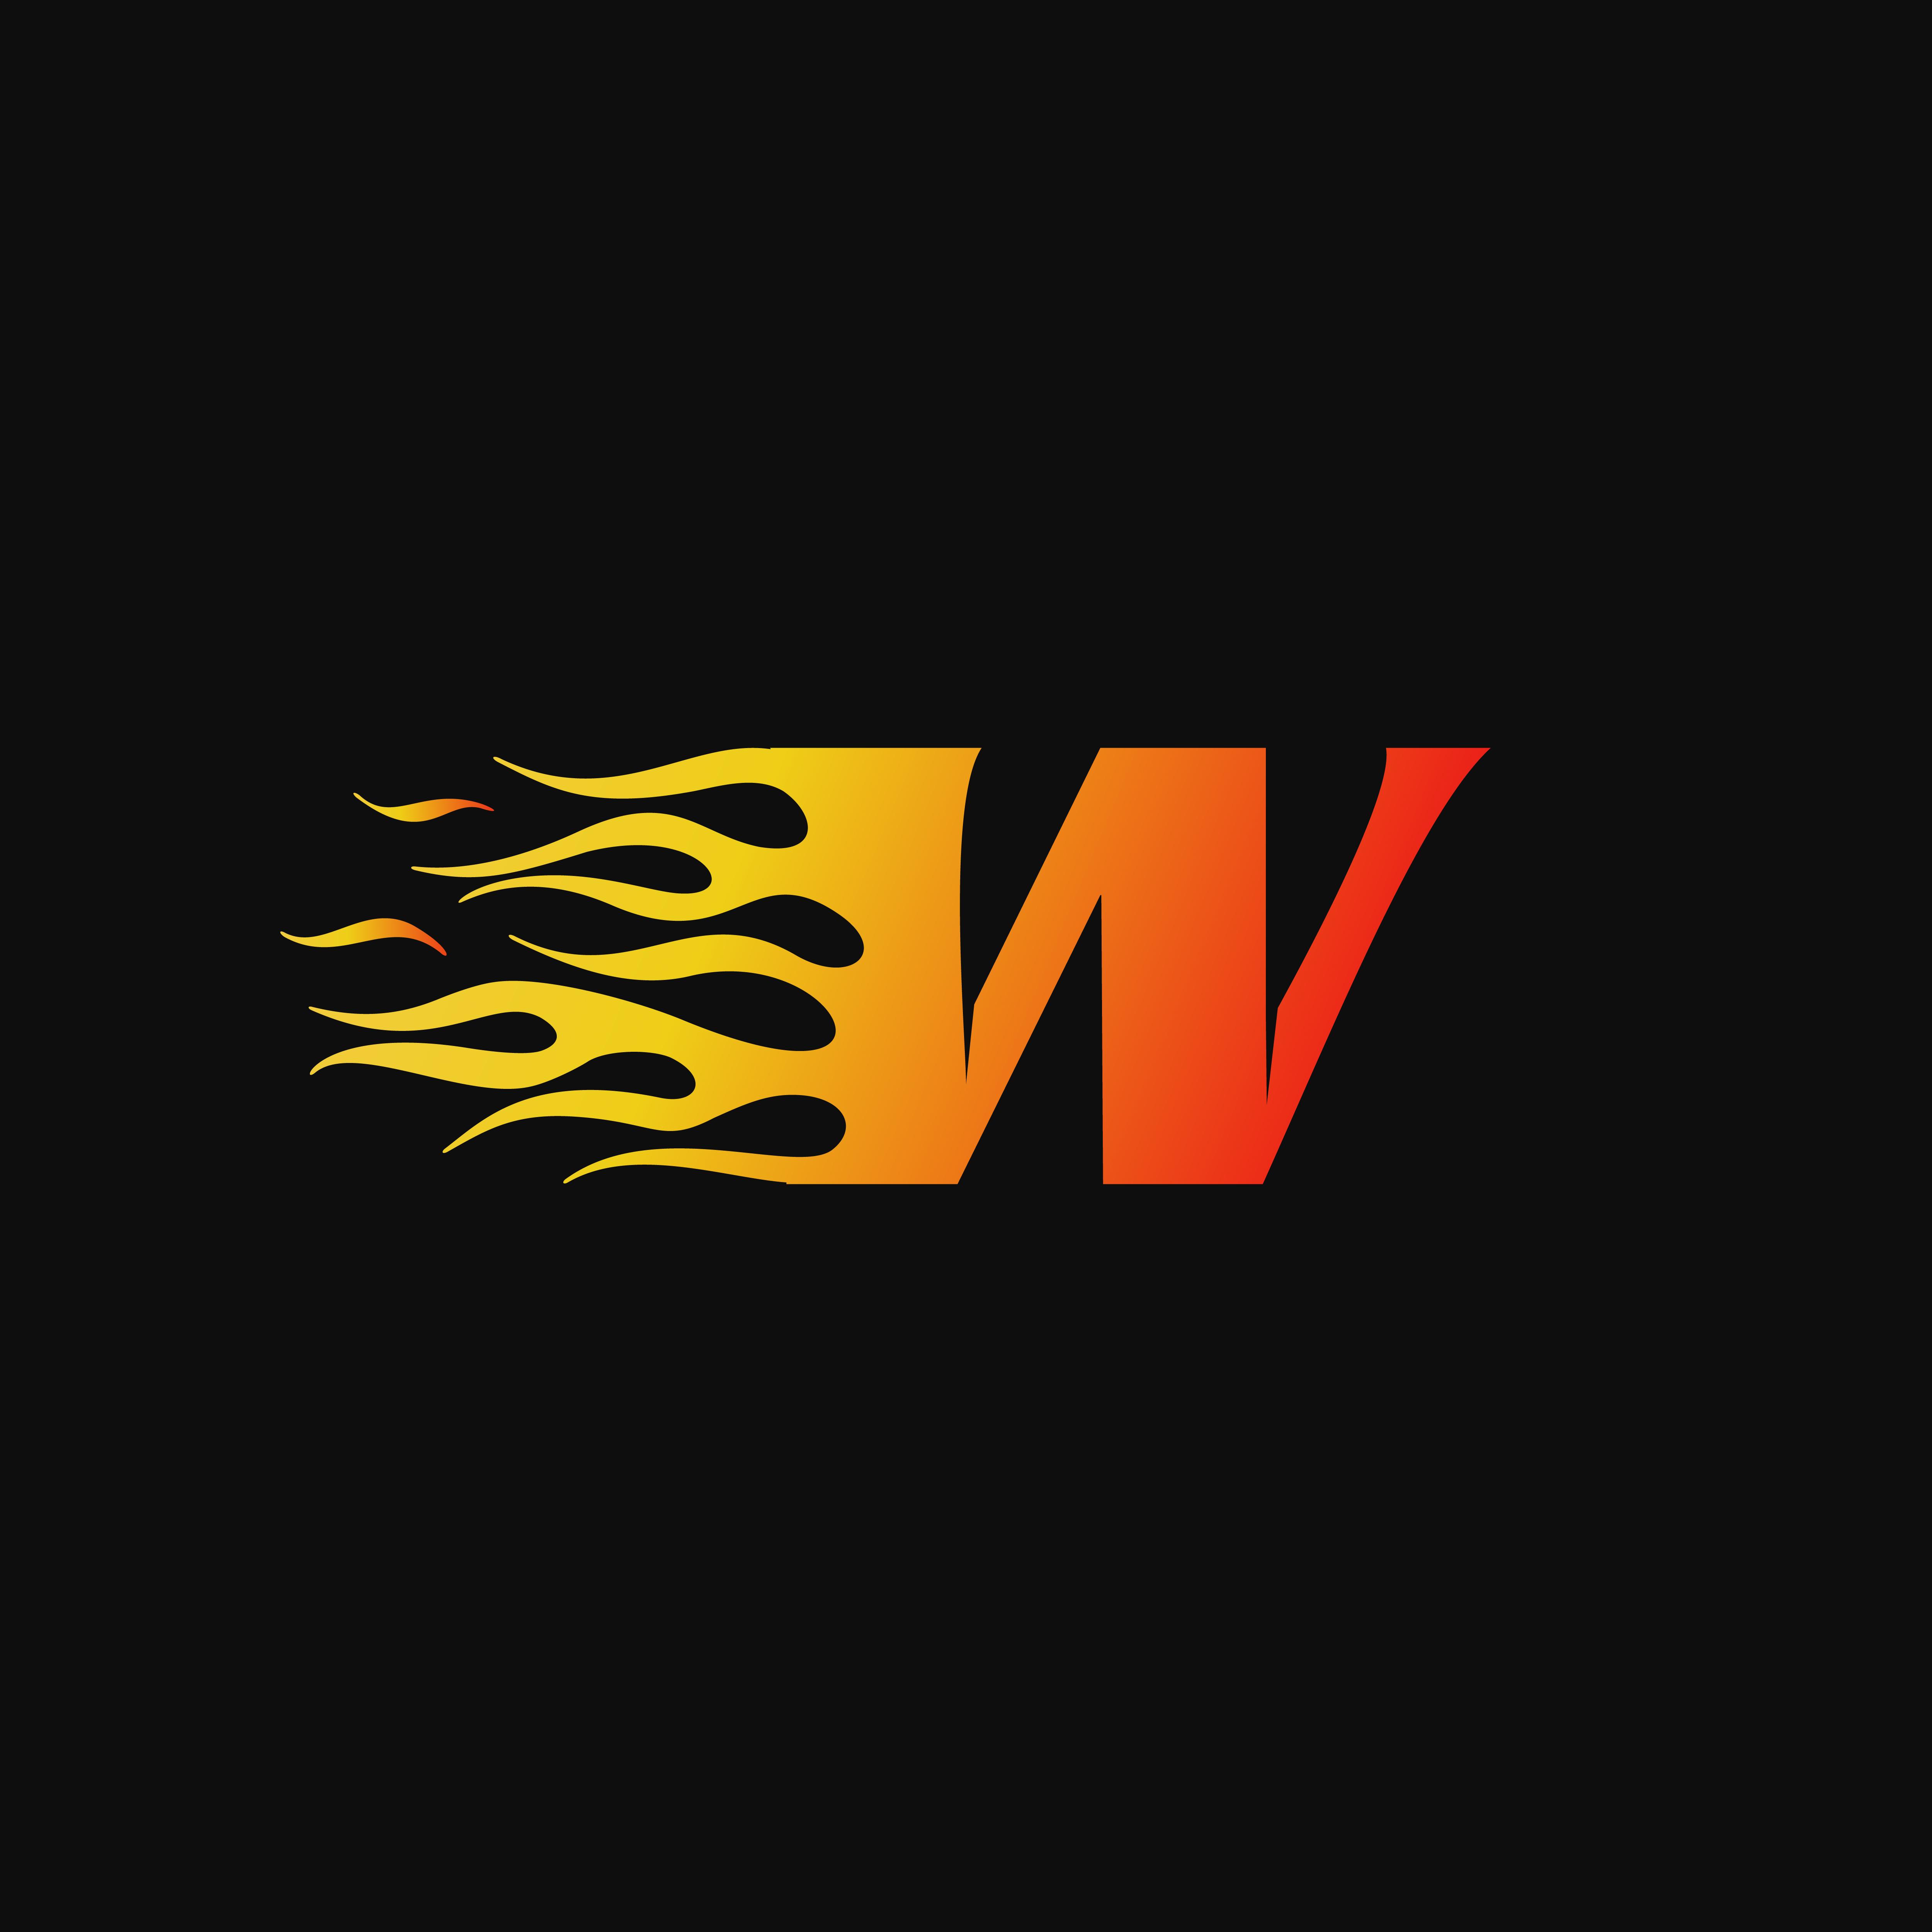 Letter W Burning Flame Logo Design Template